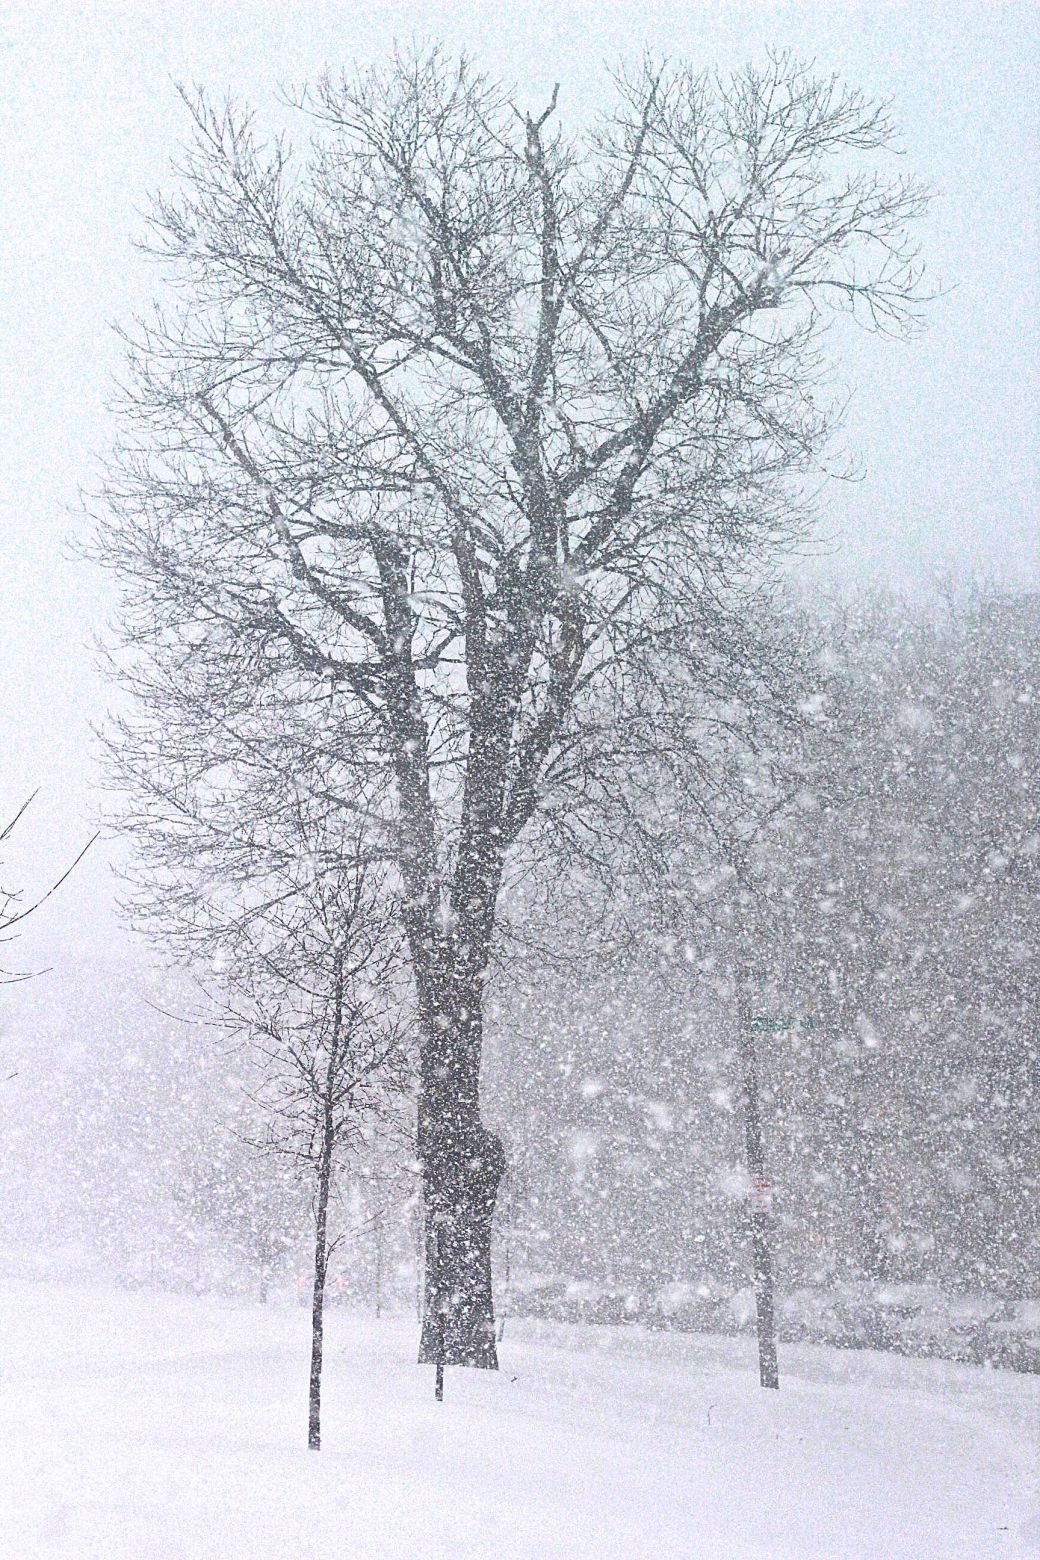 boston-snow-storm-february-9-2017-8